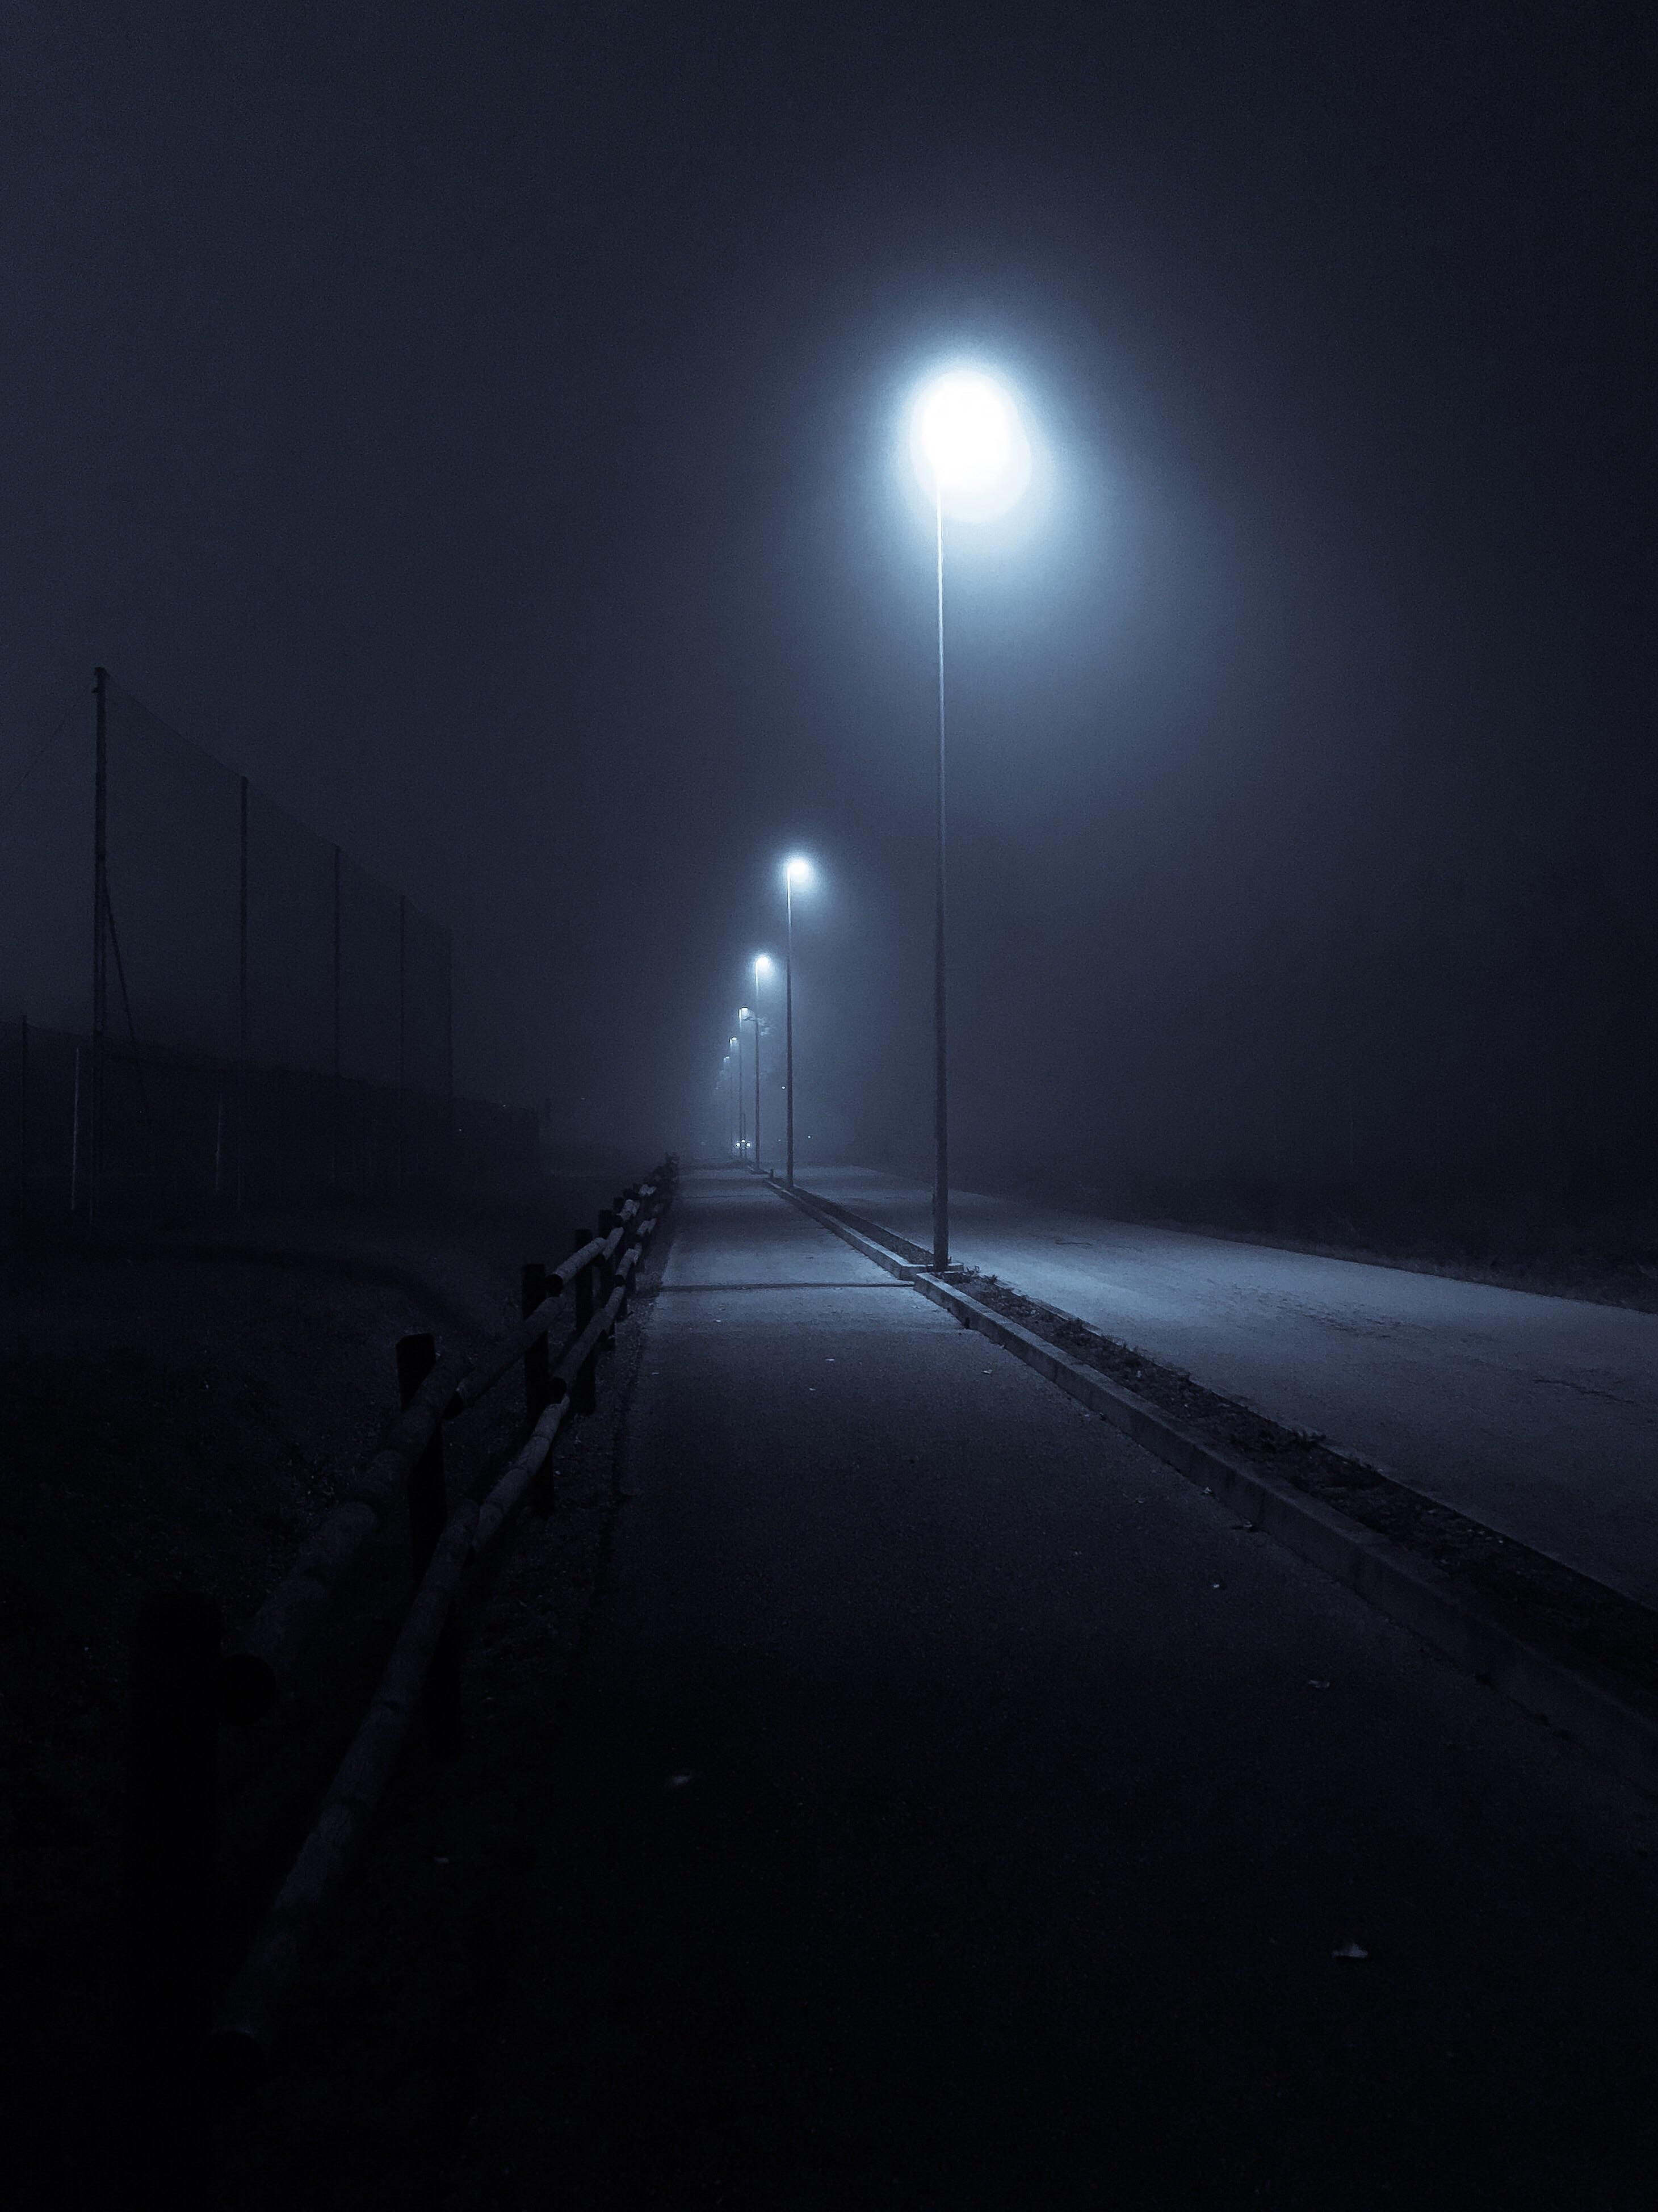 Itap Of A Road In A Foggy Night Night Scenery Night Aesthetic Dark Photography Dark street night fog light mist